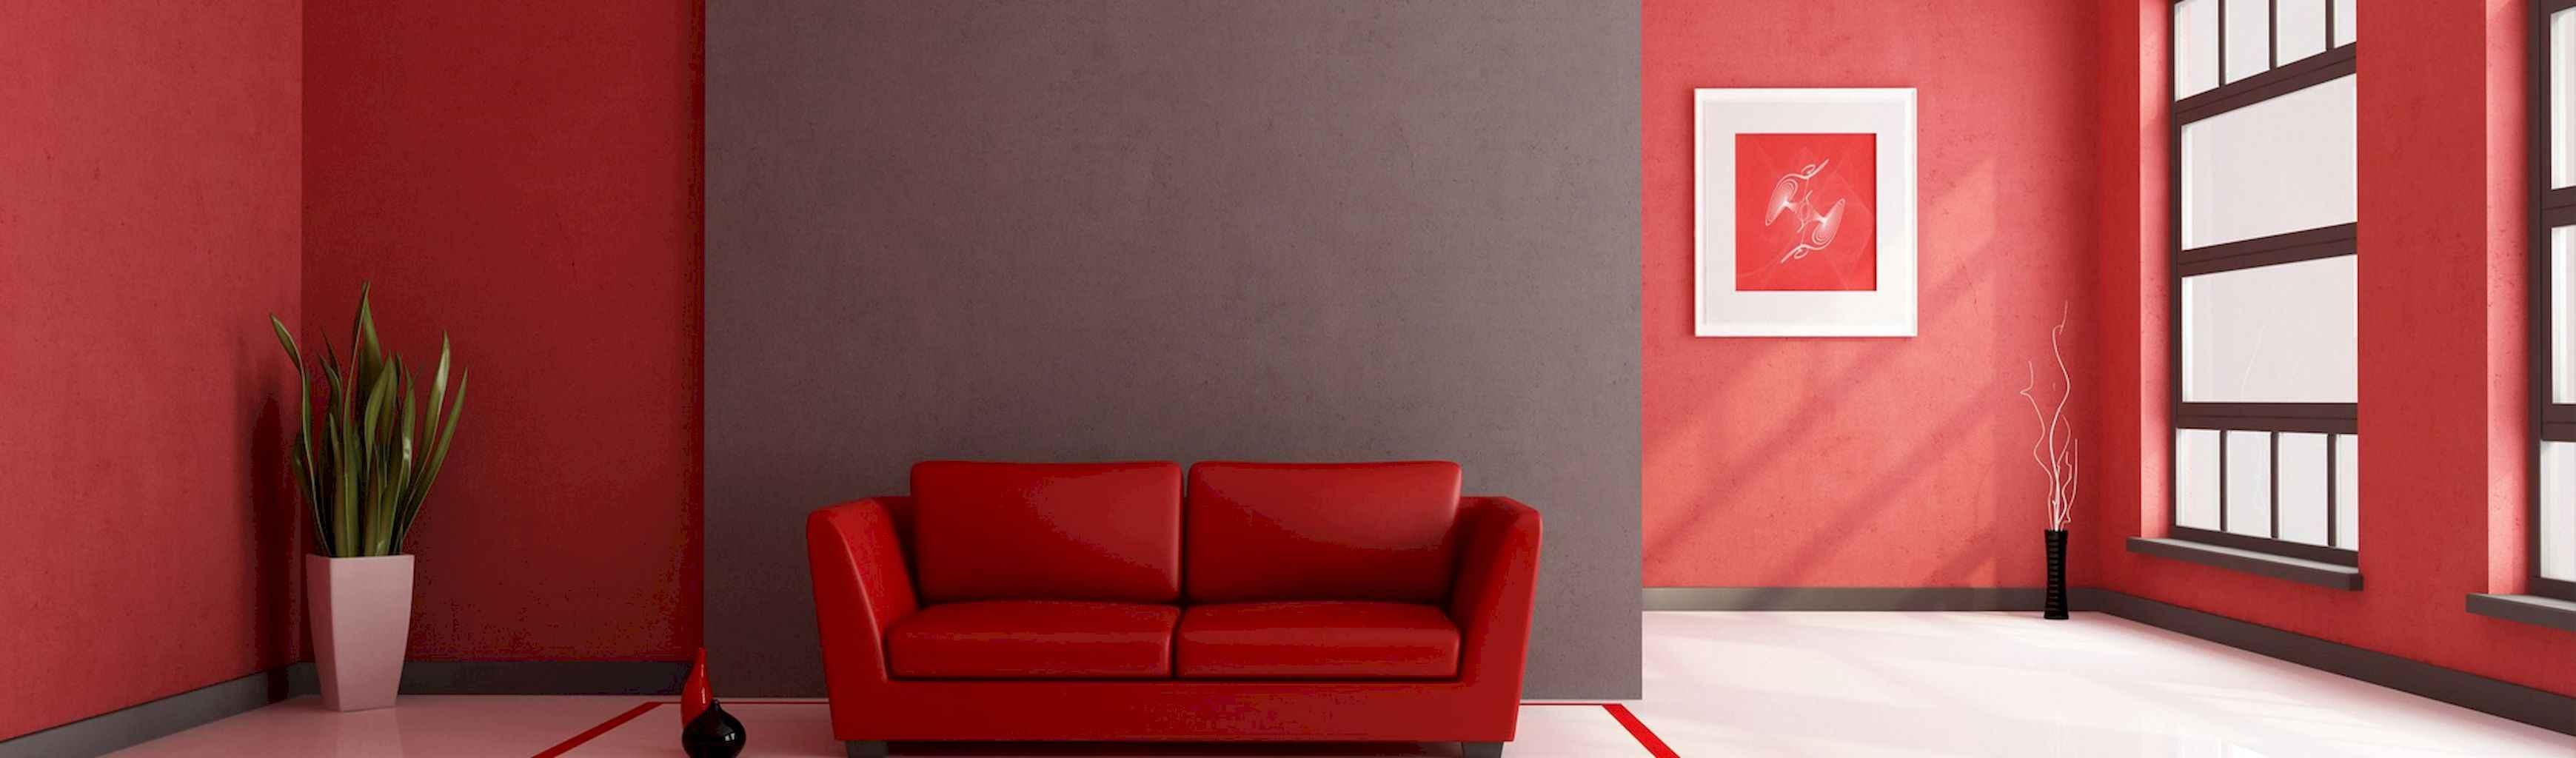 80 Elegant Harmony Interior Design Ideas For First Couple (17)